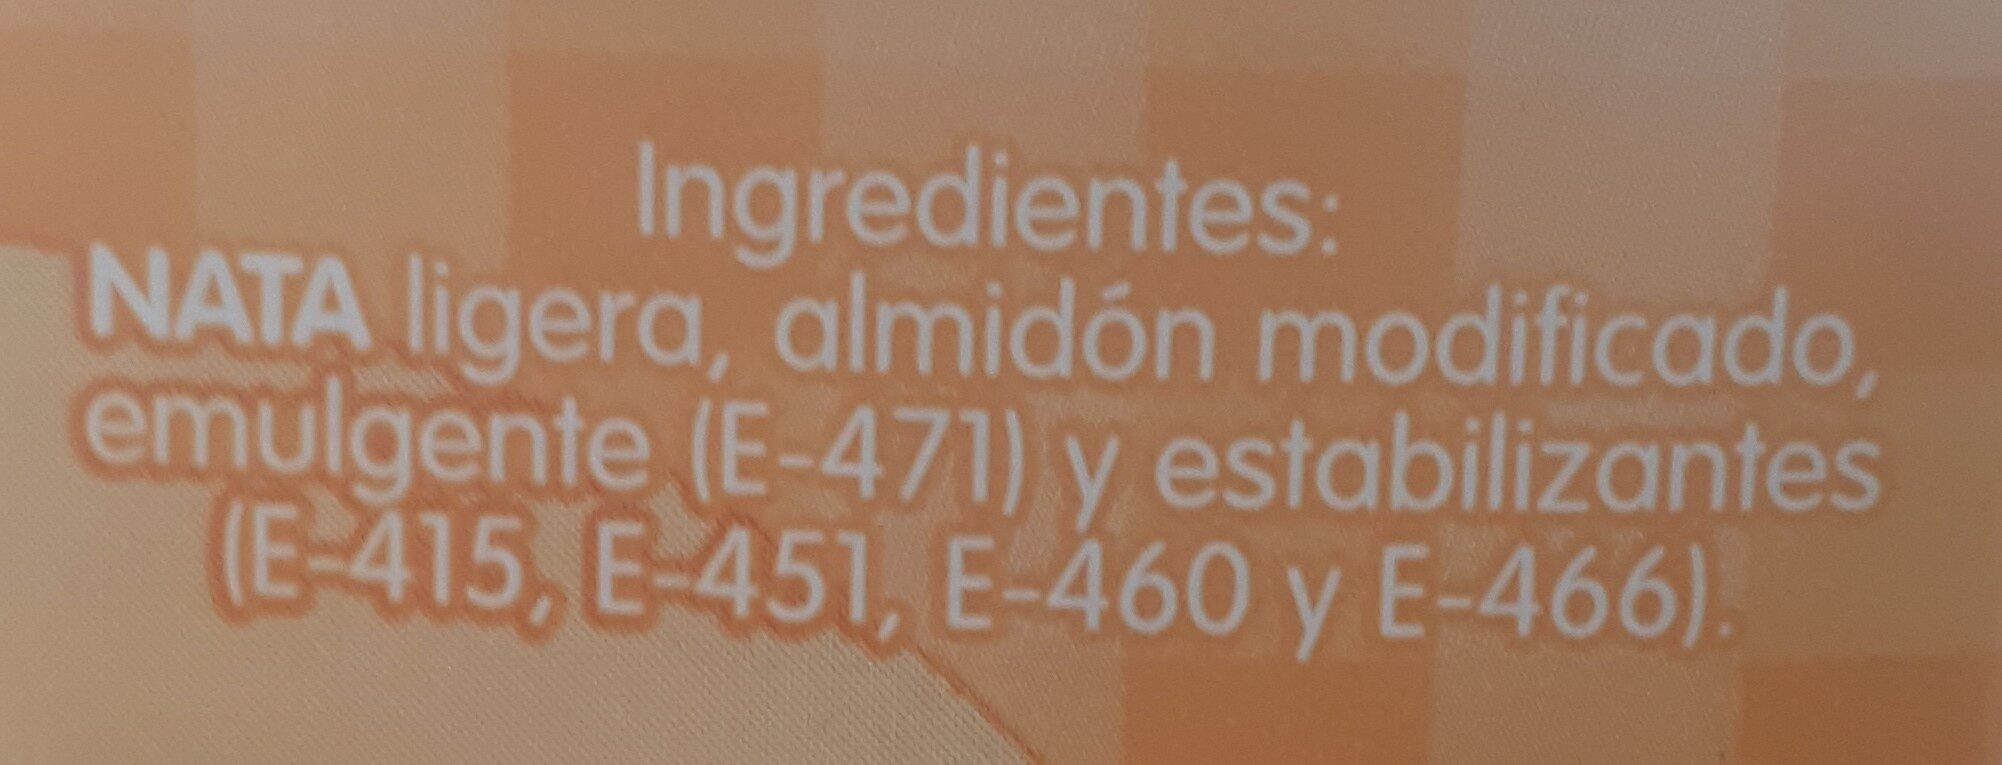 Nata Ligera Uht 15% Materia Grasa - Ingredients